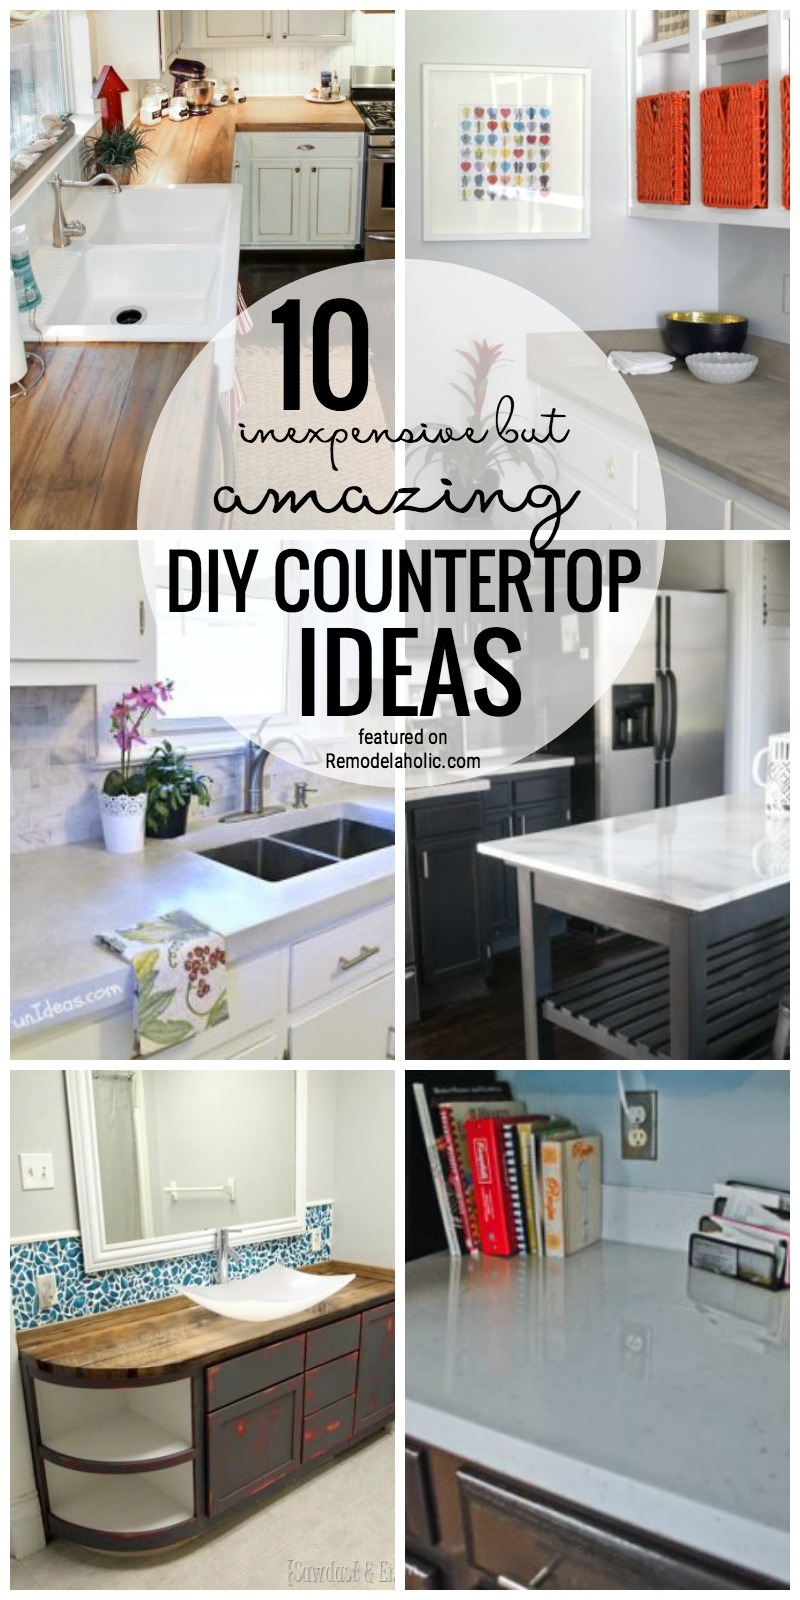 kitchen remodels ideas shaker cabinet doors remodelaholic | 10 inexpensive but amazing diy countertop ...